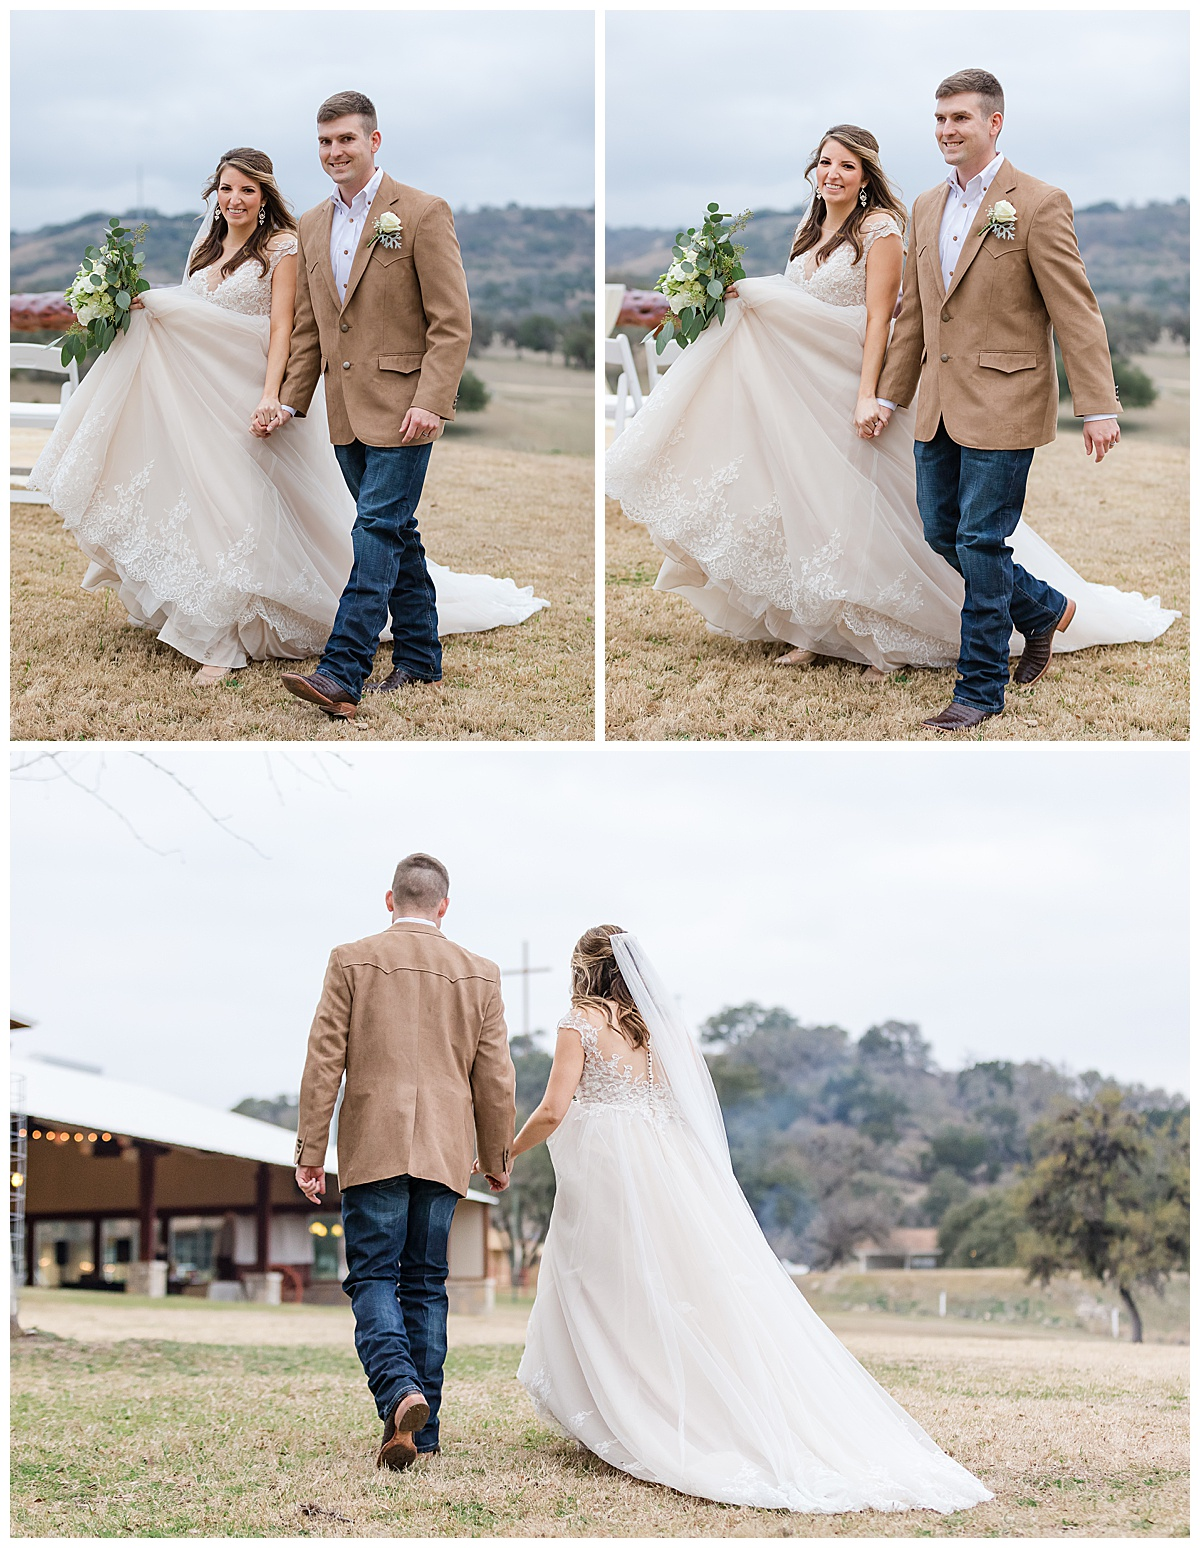 Wedding-Photographer-Texas-Hill-Country-Happy-H-Ranch-Comfor-Texas-Carly-Barton-Photography_0048.jpg